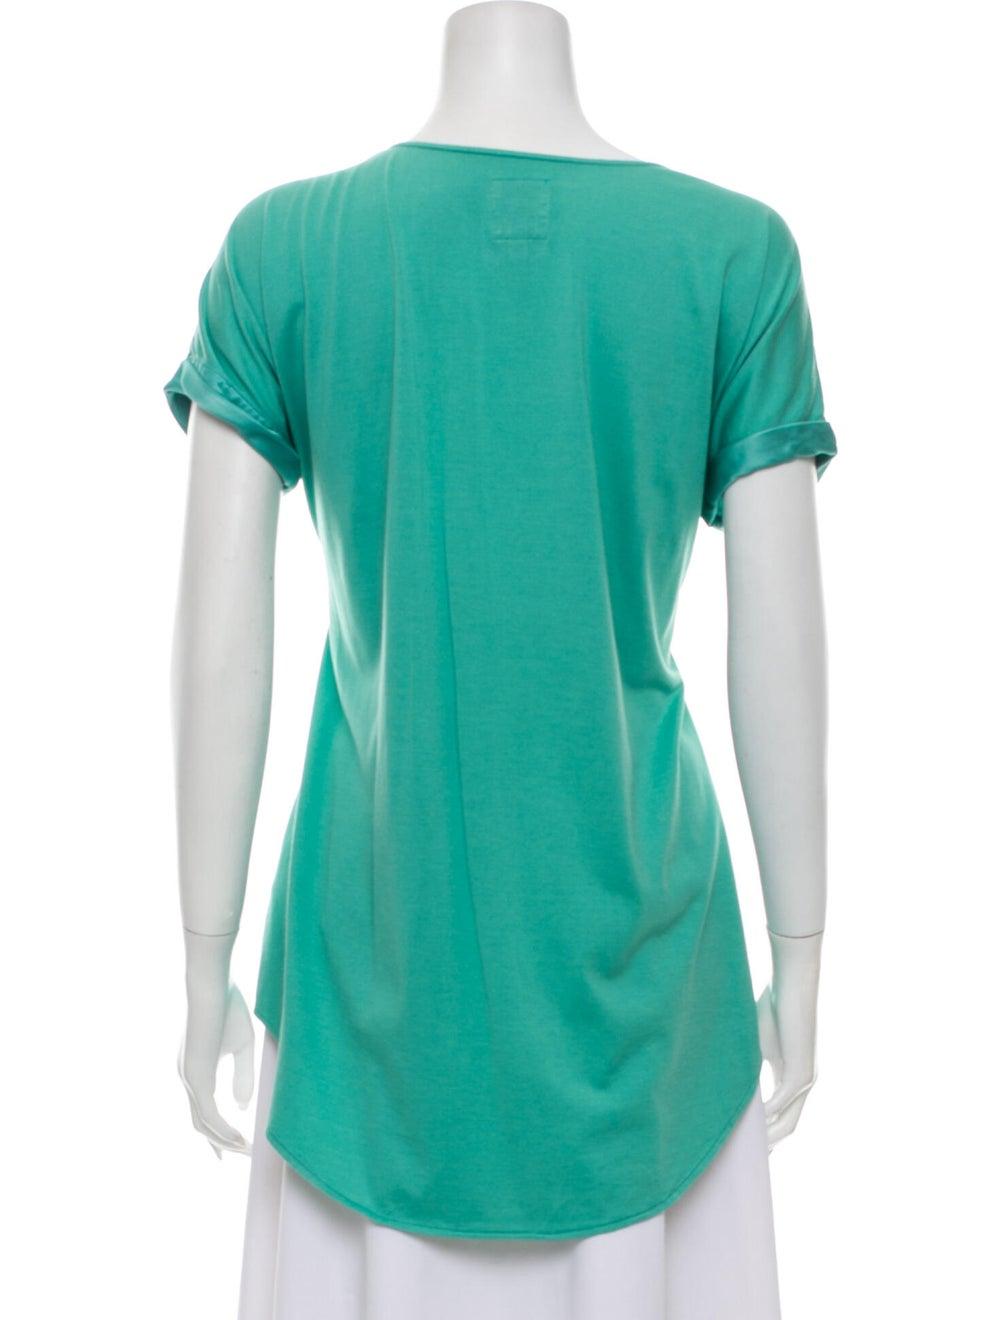 Go Silk Silk Scoop Neck T-Shirt Green - image 3